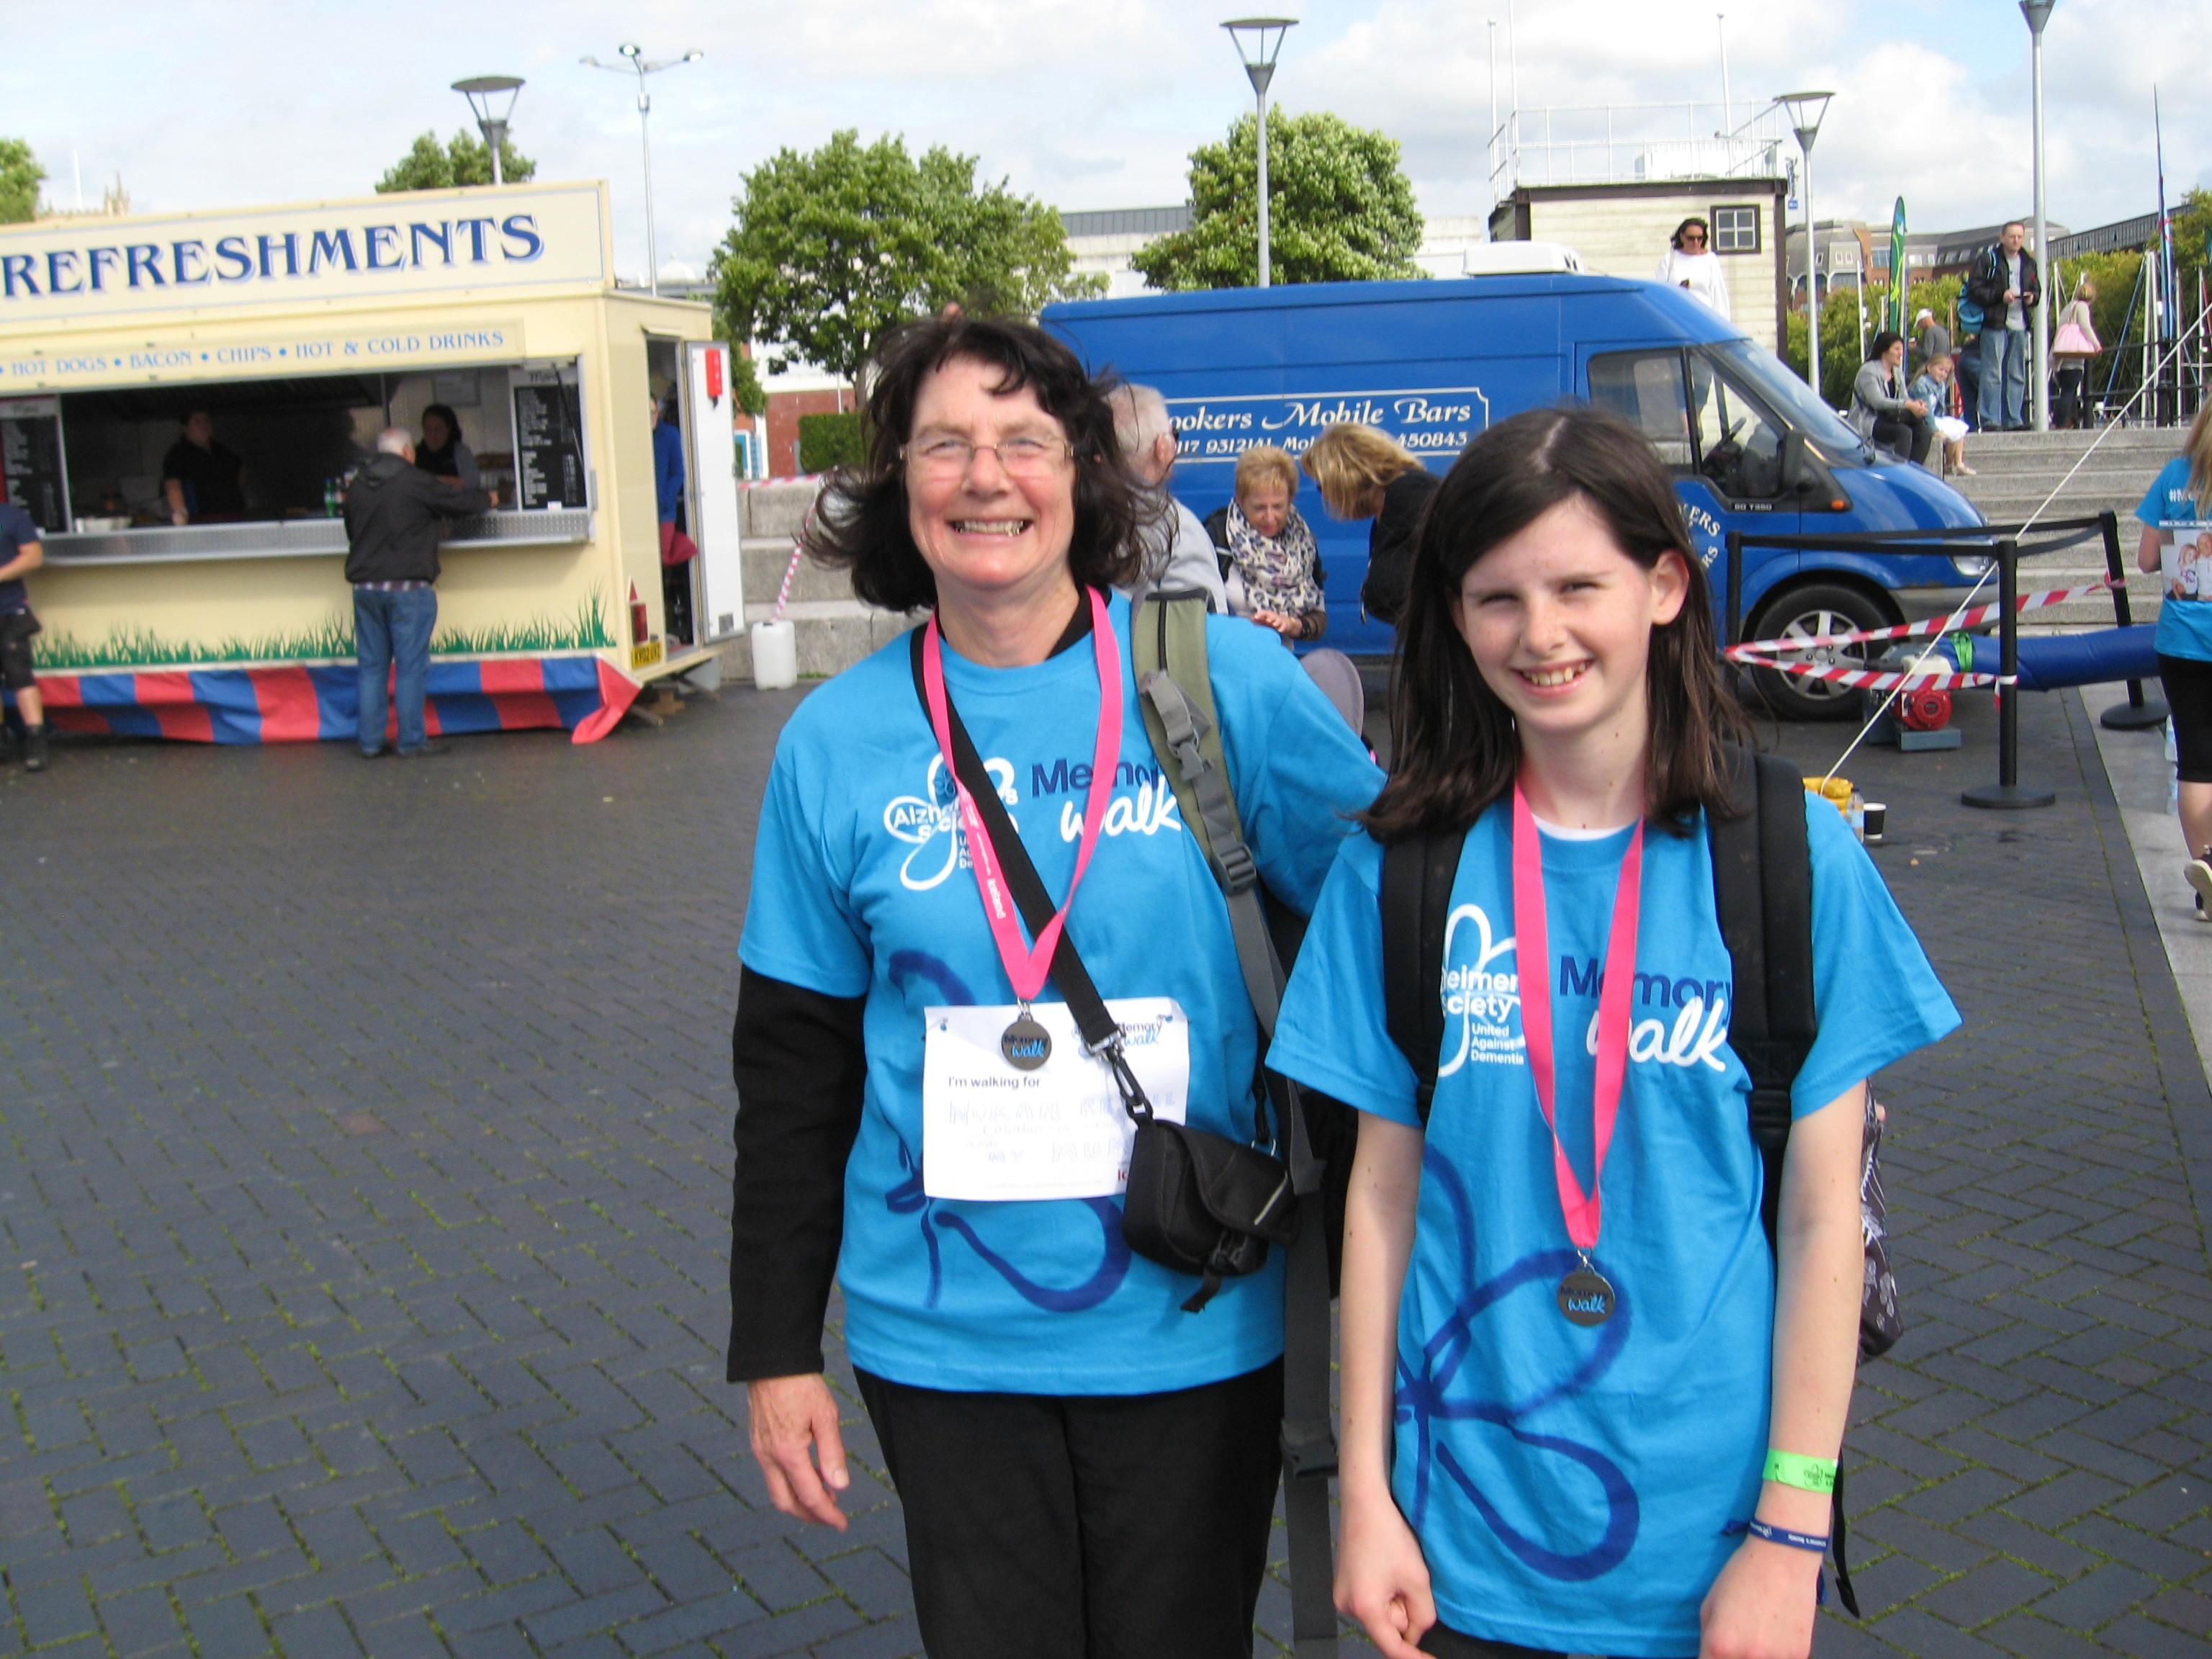 Dementia walk helps to raise awareness